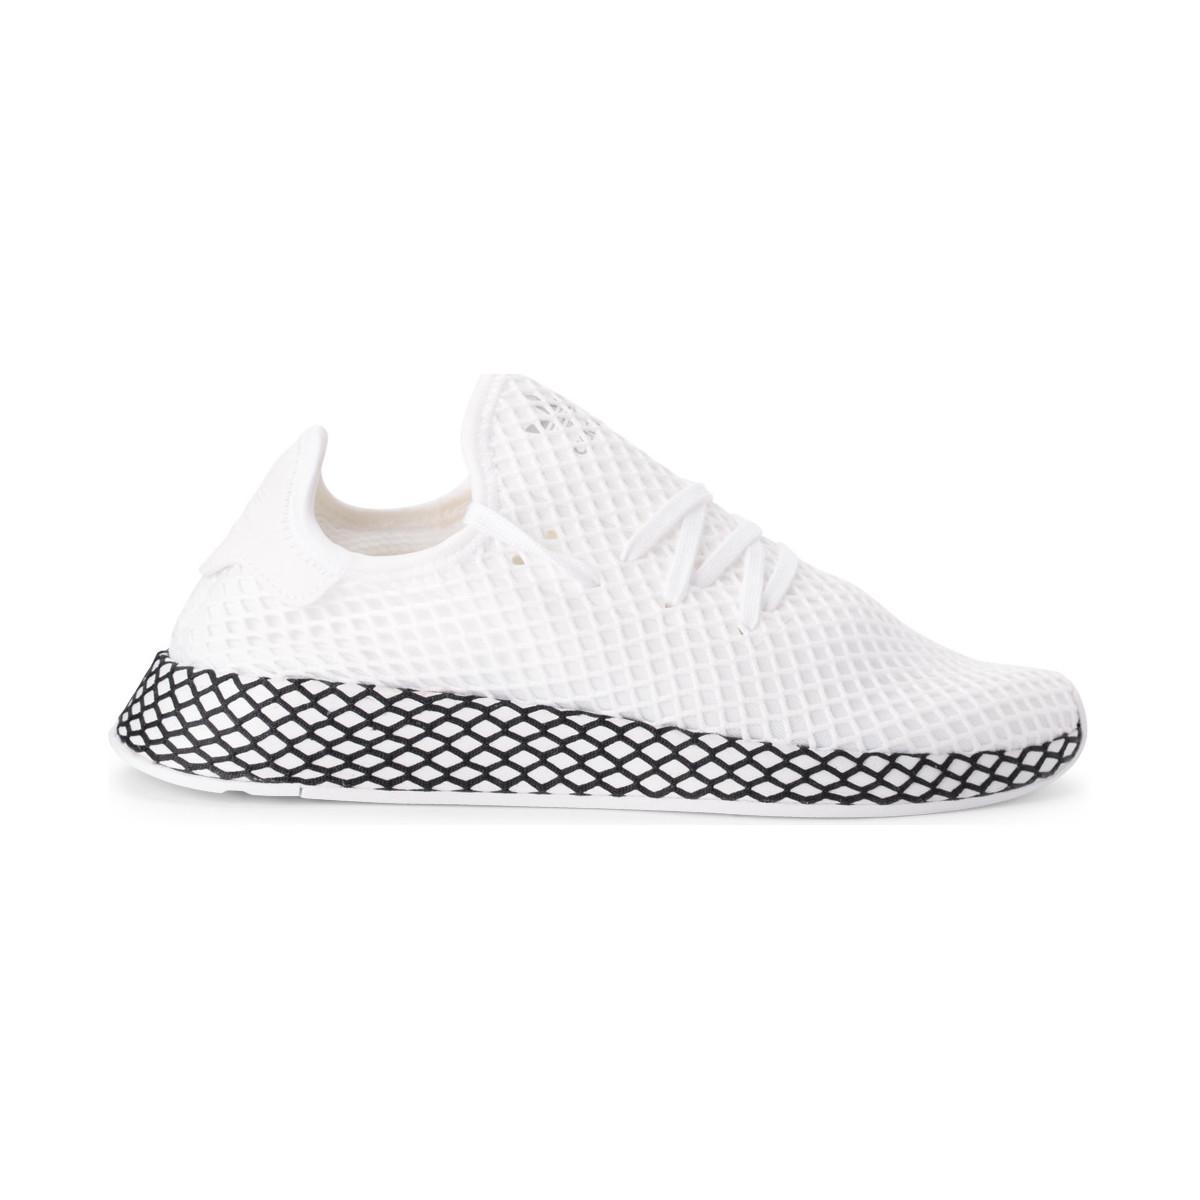 super popular d24f6 a79e0 adidas. Deerupt White Mesh ...